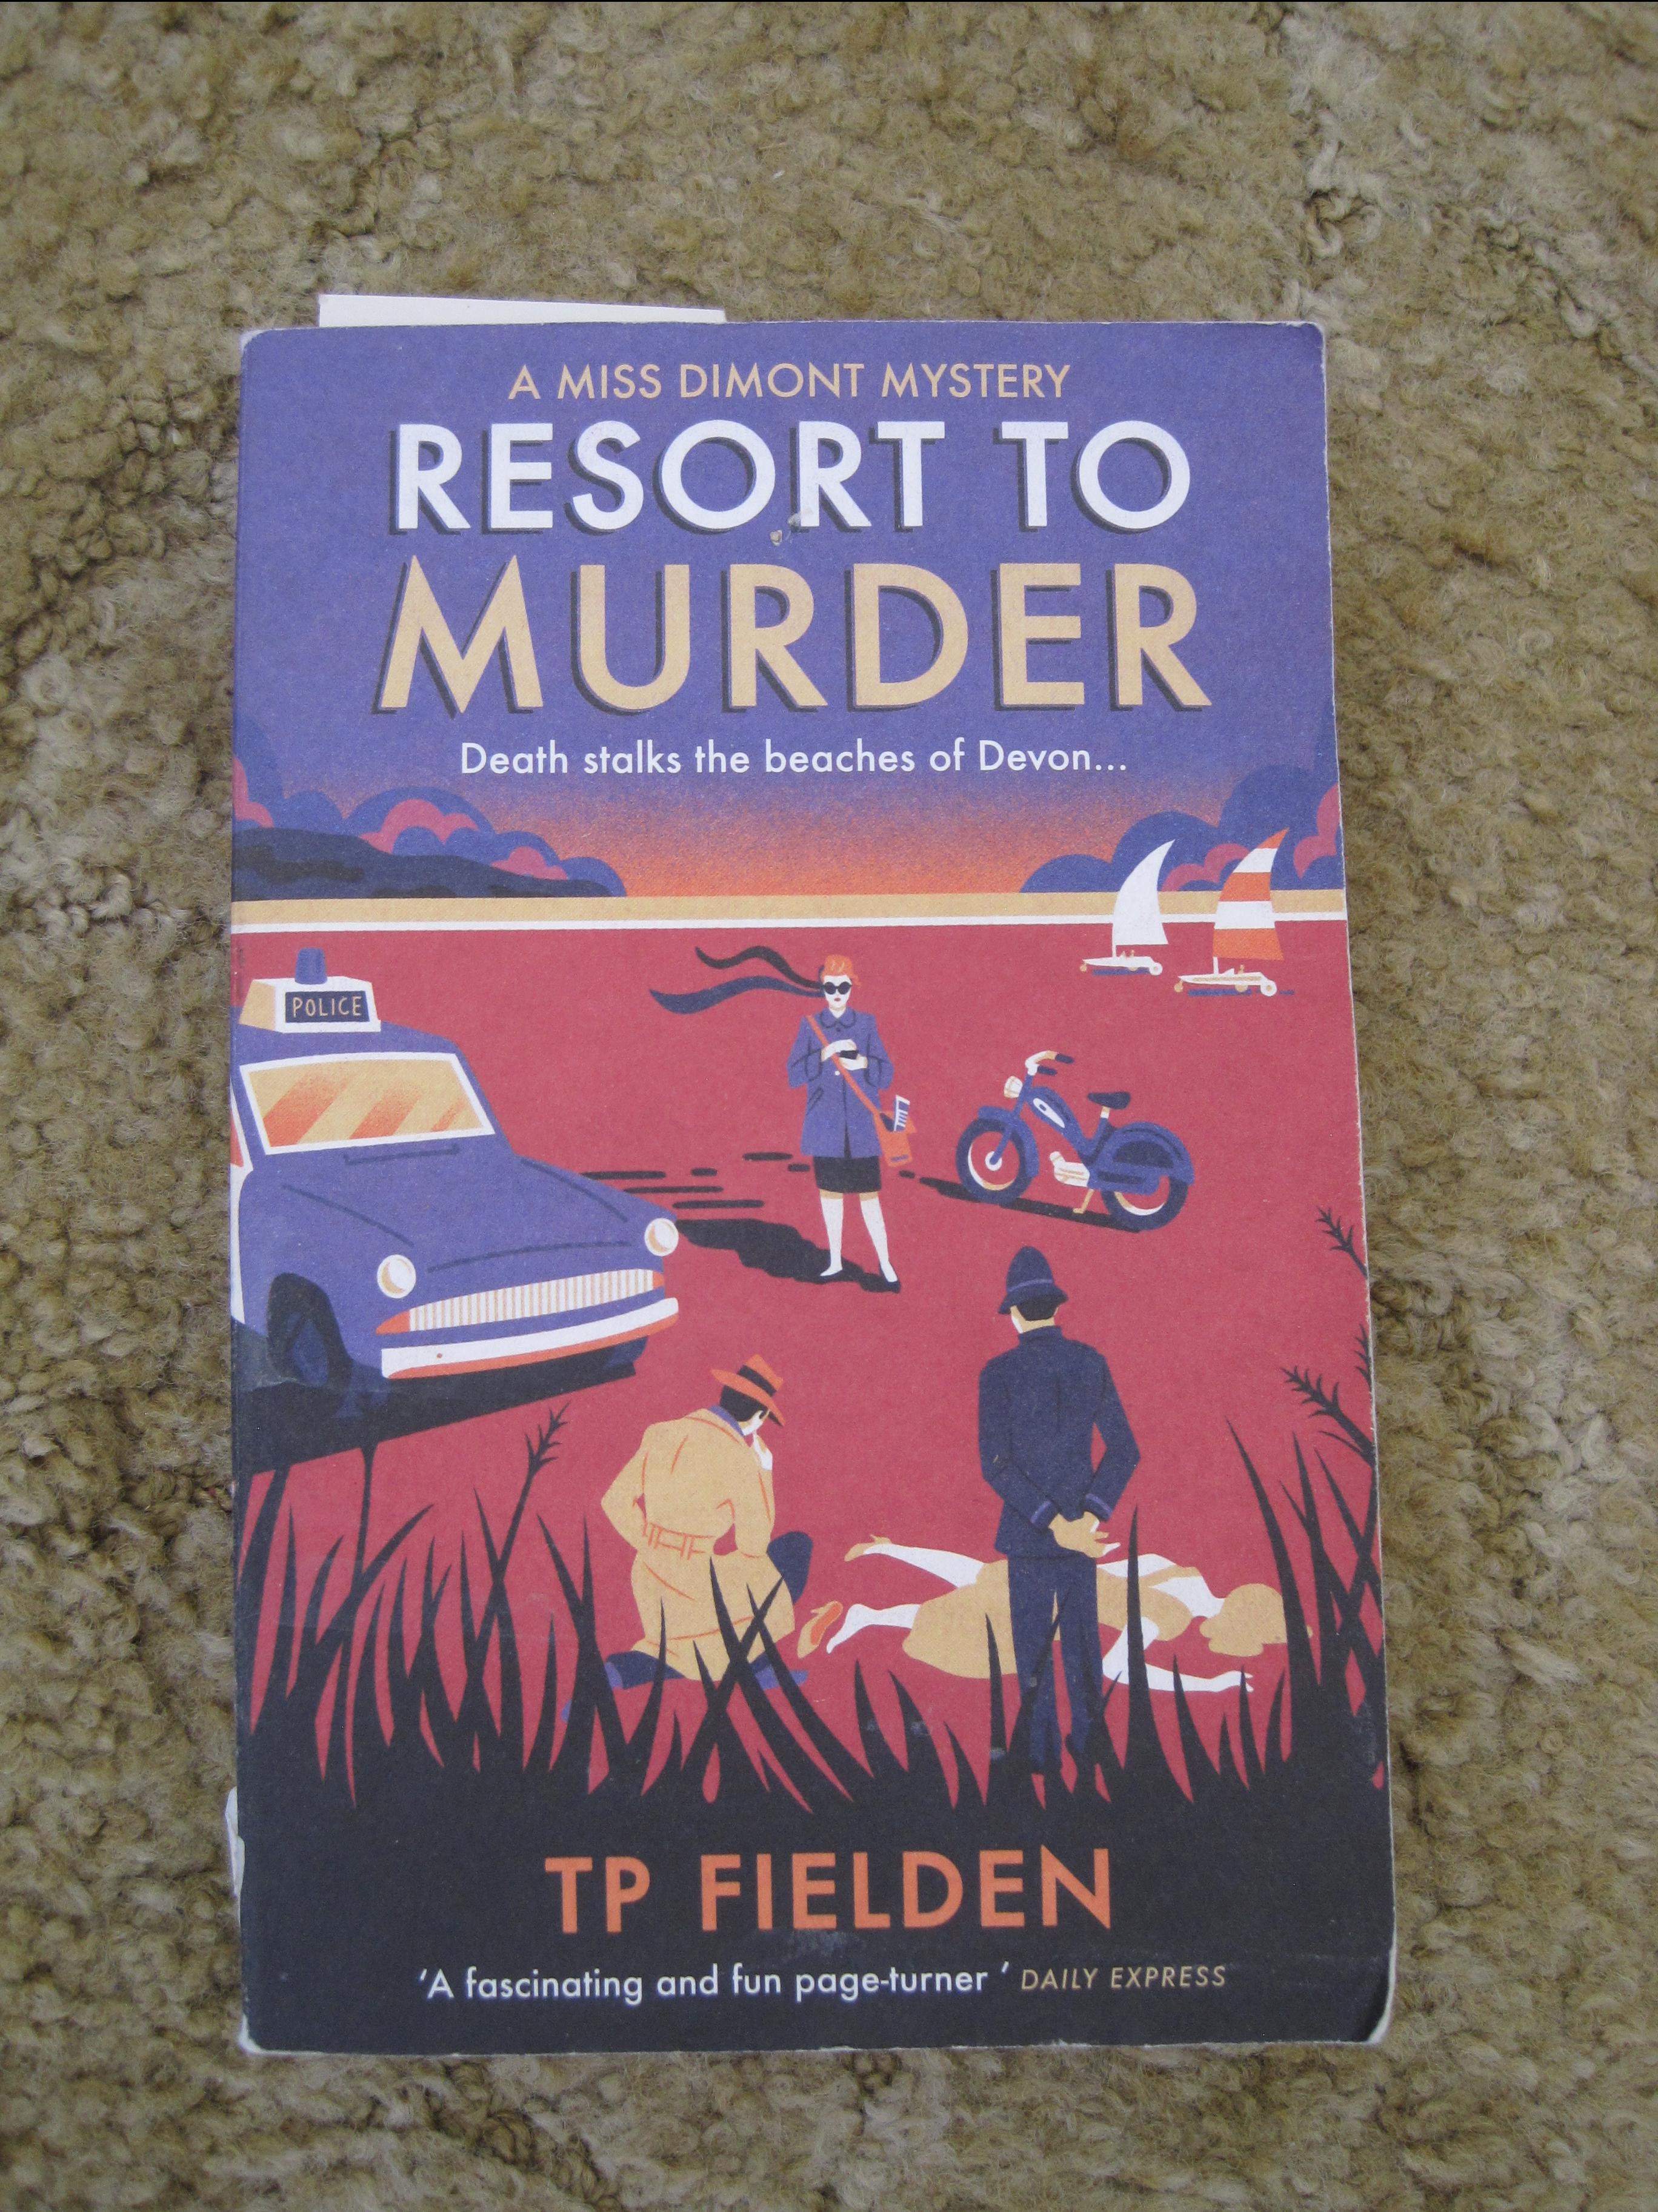 Resort To Murder - photo by Juliamaud